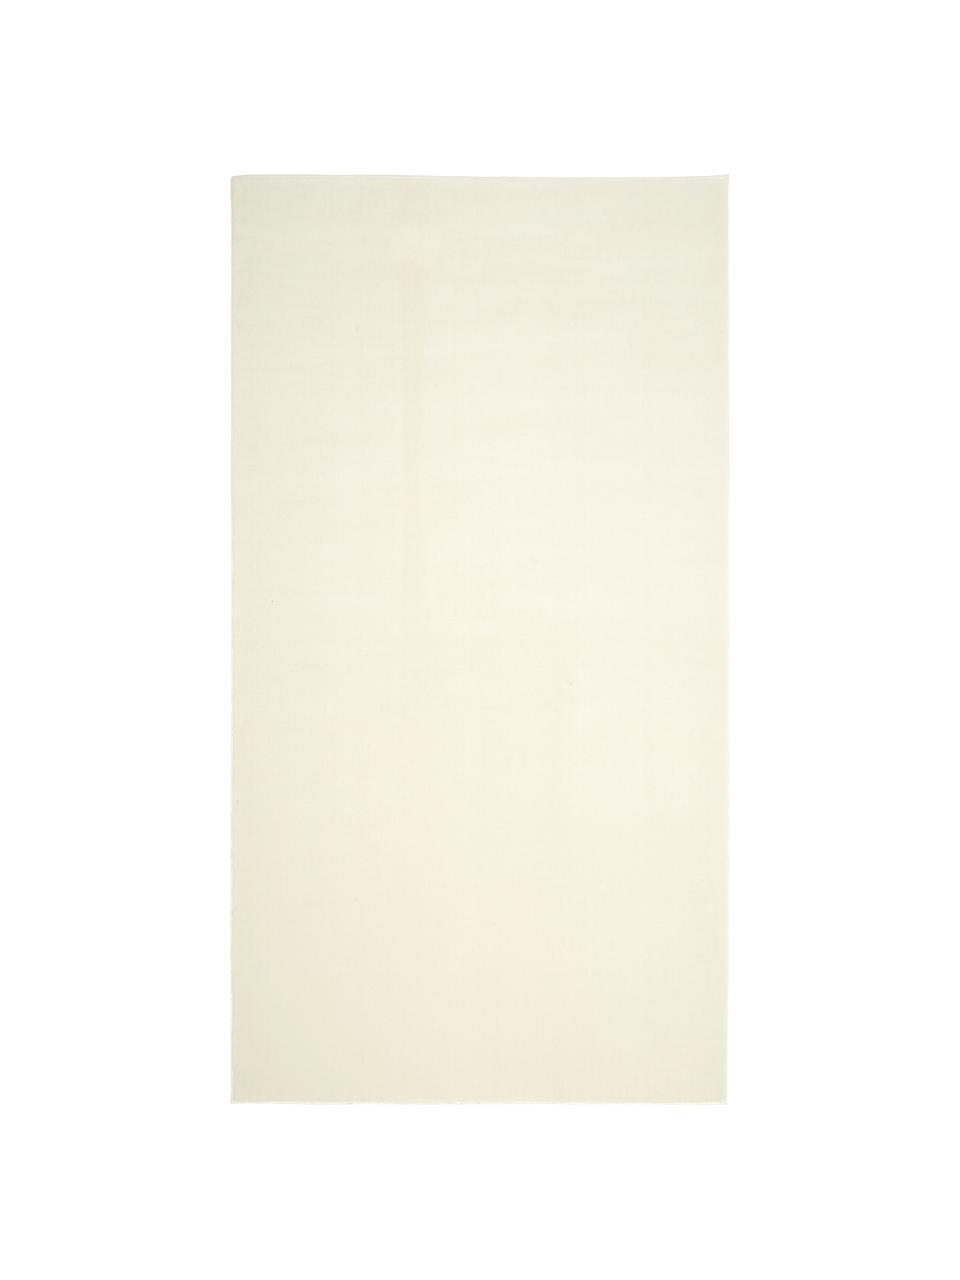 Tappeto in lana beige Ida, Retro: 60% juta, 40% poliestere , Beige, Larg. 160 x Lung. 230 cm (taglia M)